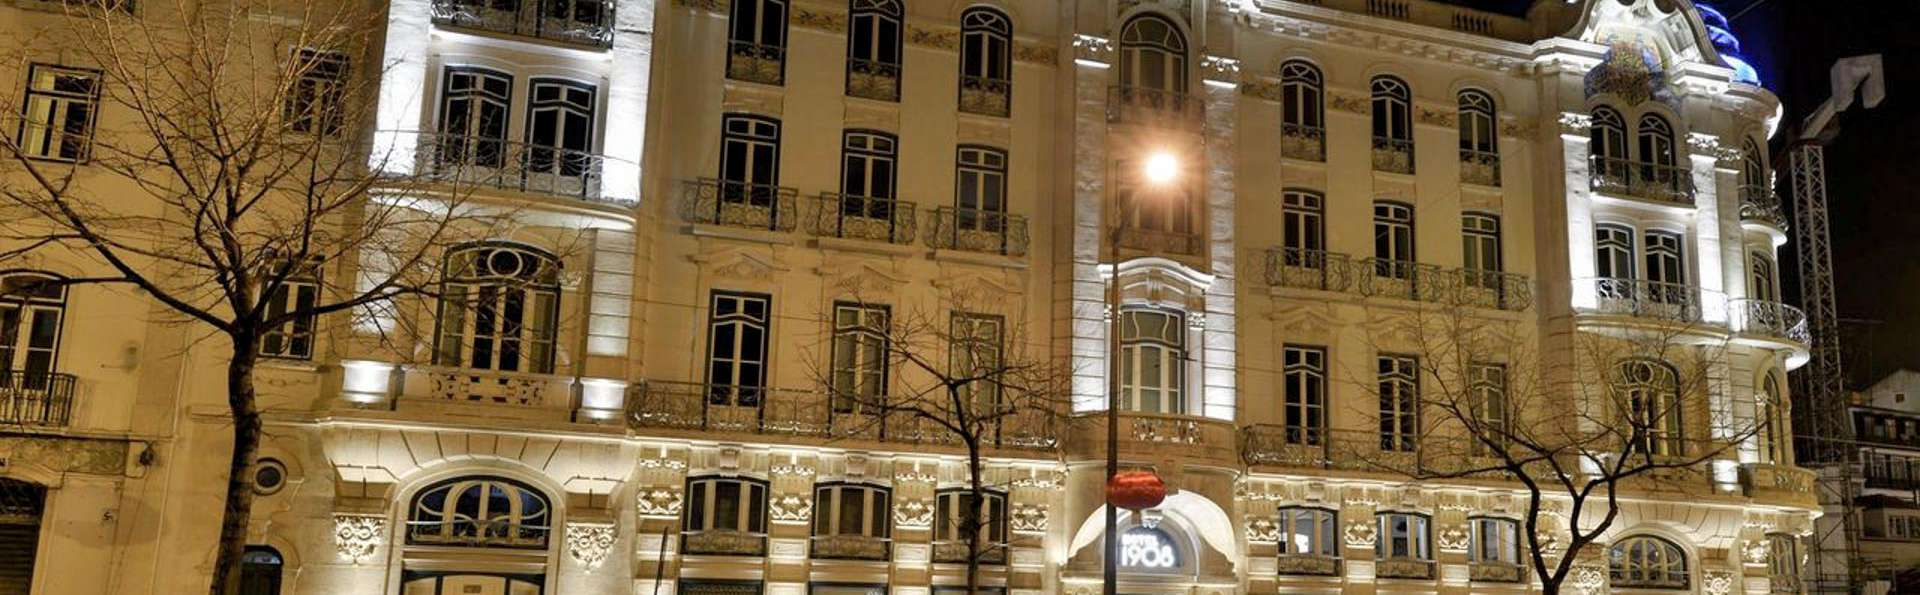 1908 Lisboa Hotel - EDIT_FRONT_01.jpg